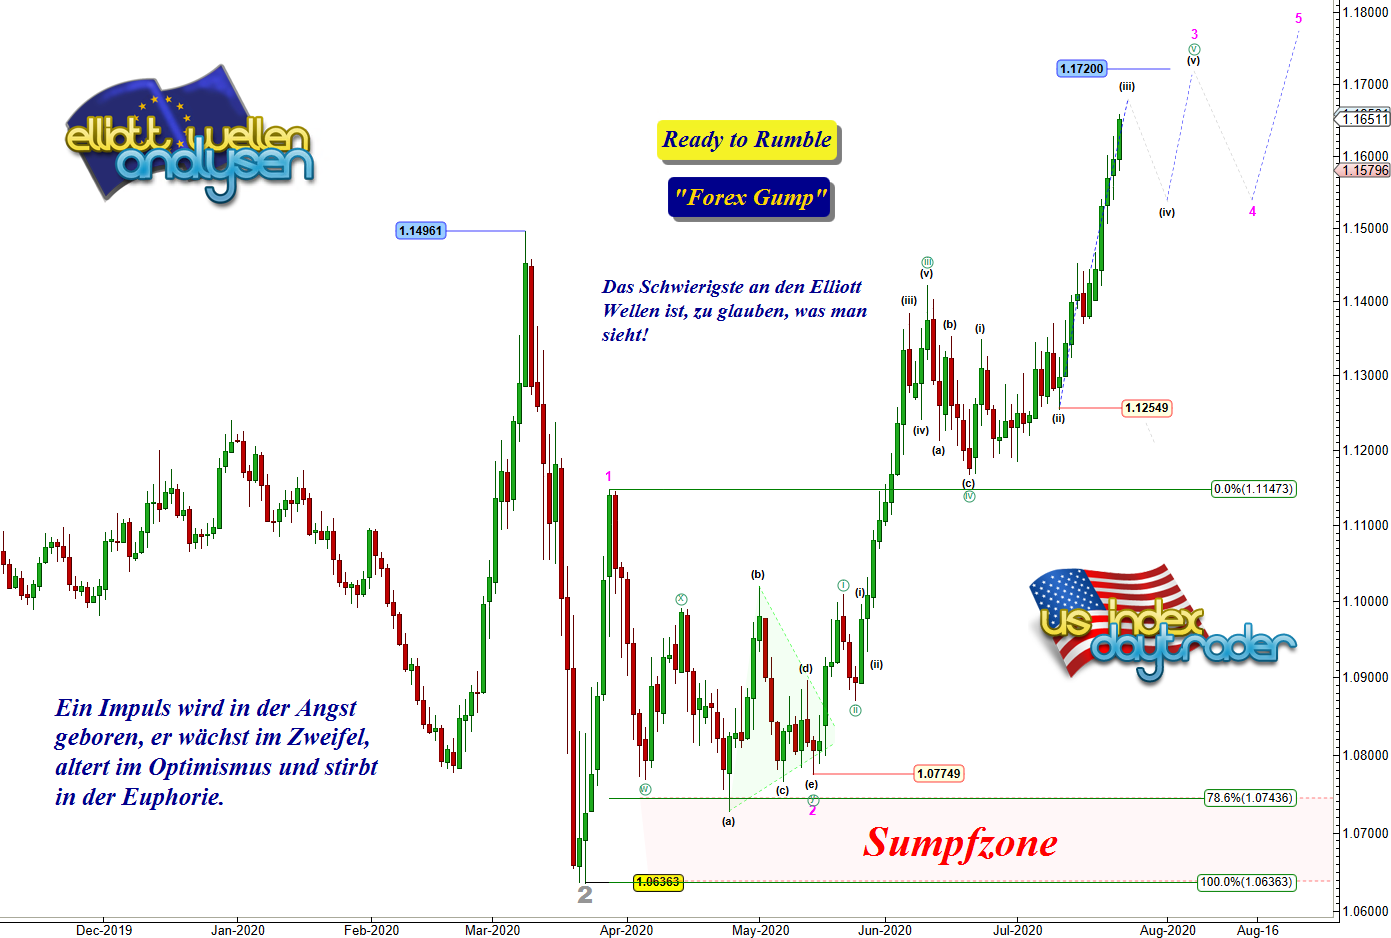 EW-Analyse-EUR-USD-Ohne-Worte-Chartanalyse-André-Tiedje-GodmodeTrader.de-1